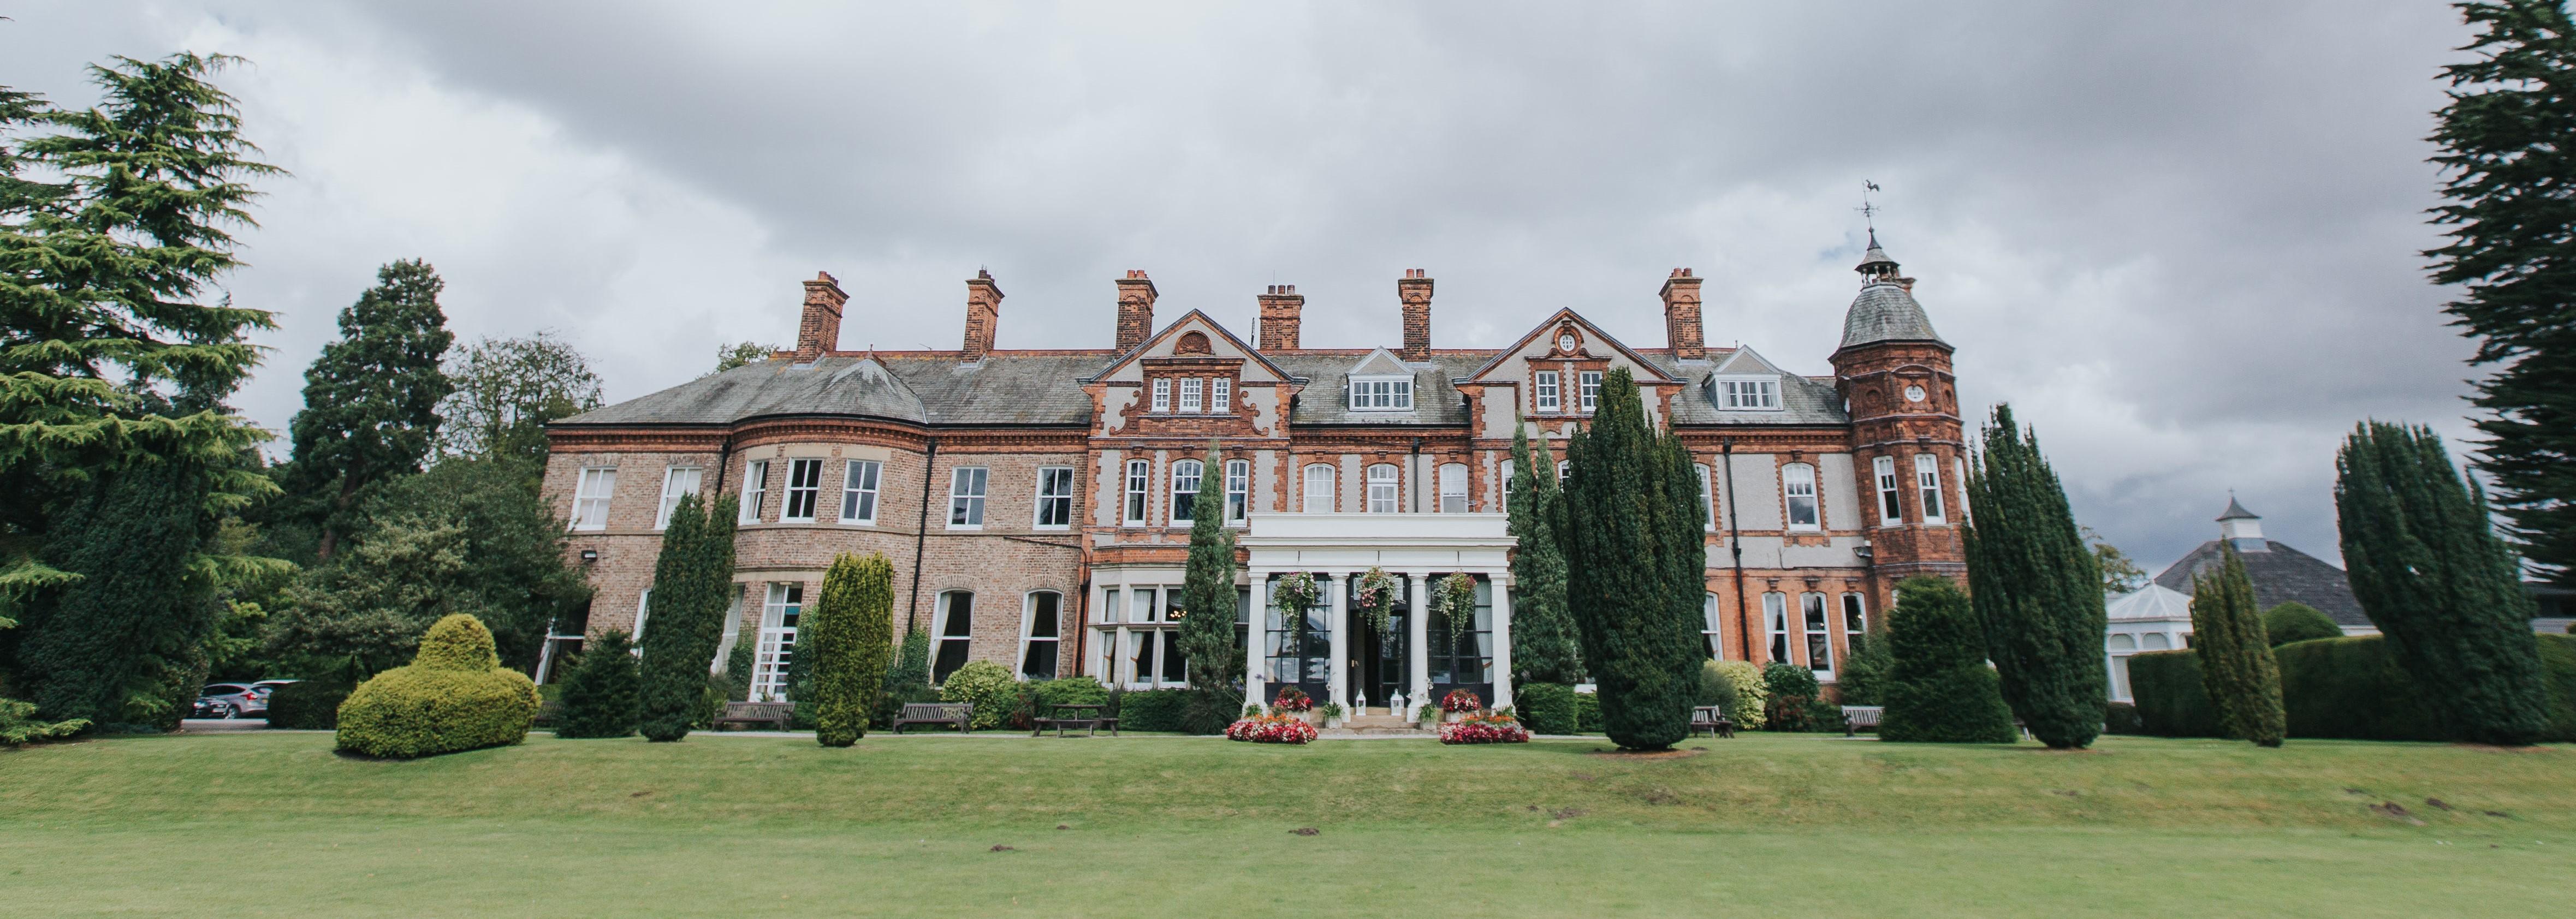 The Hawkhills House